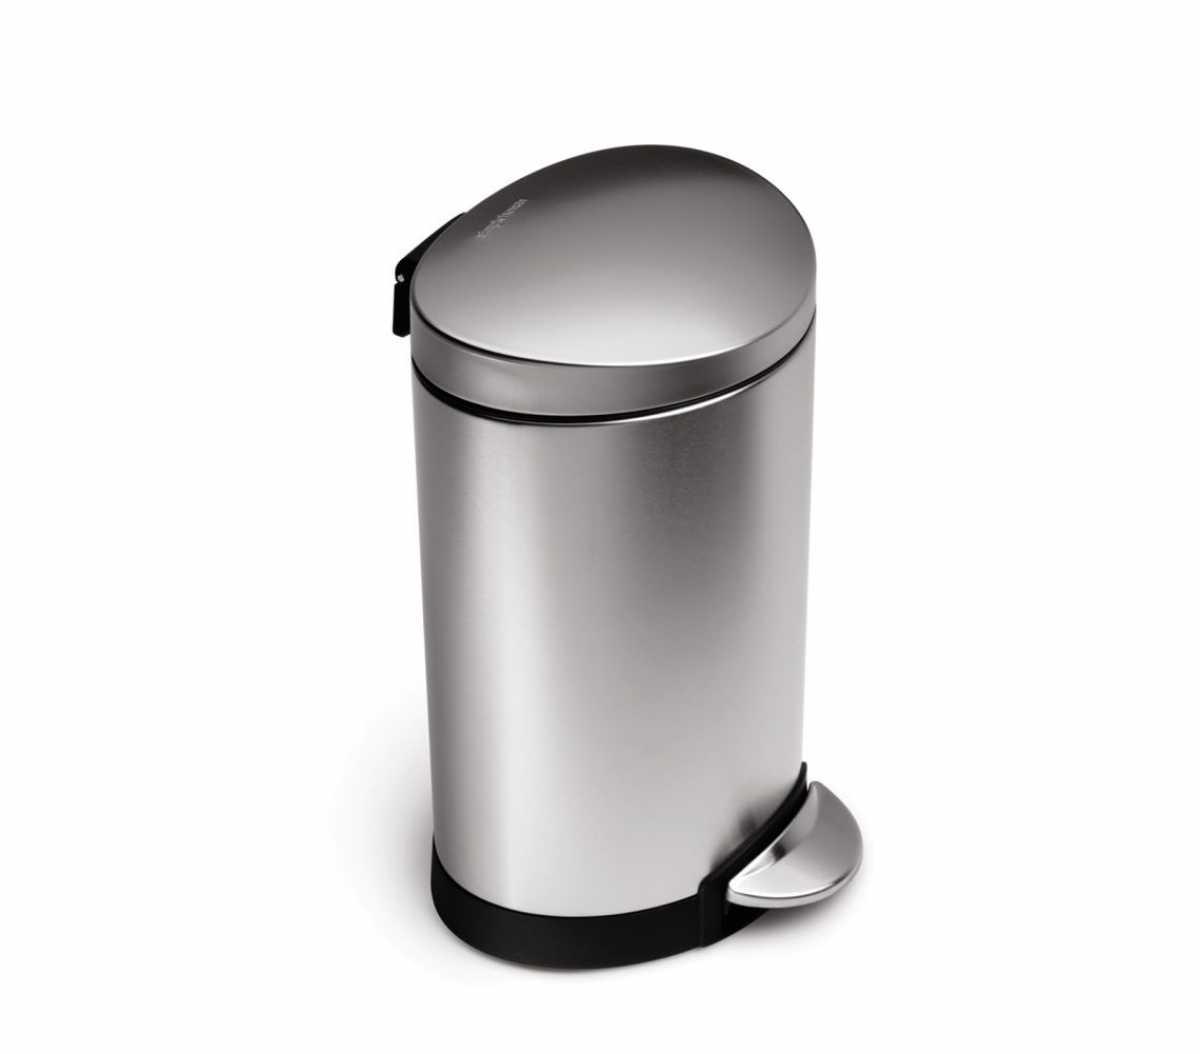 Pedallı Çöp Kovası, 6 litre